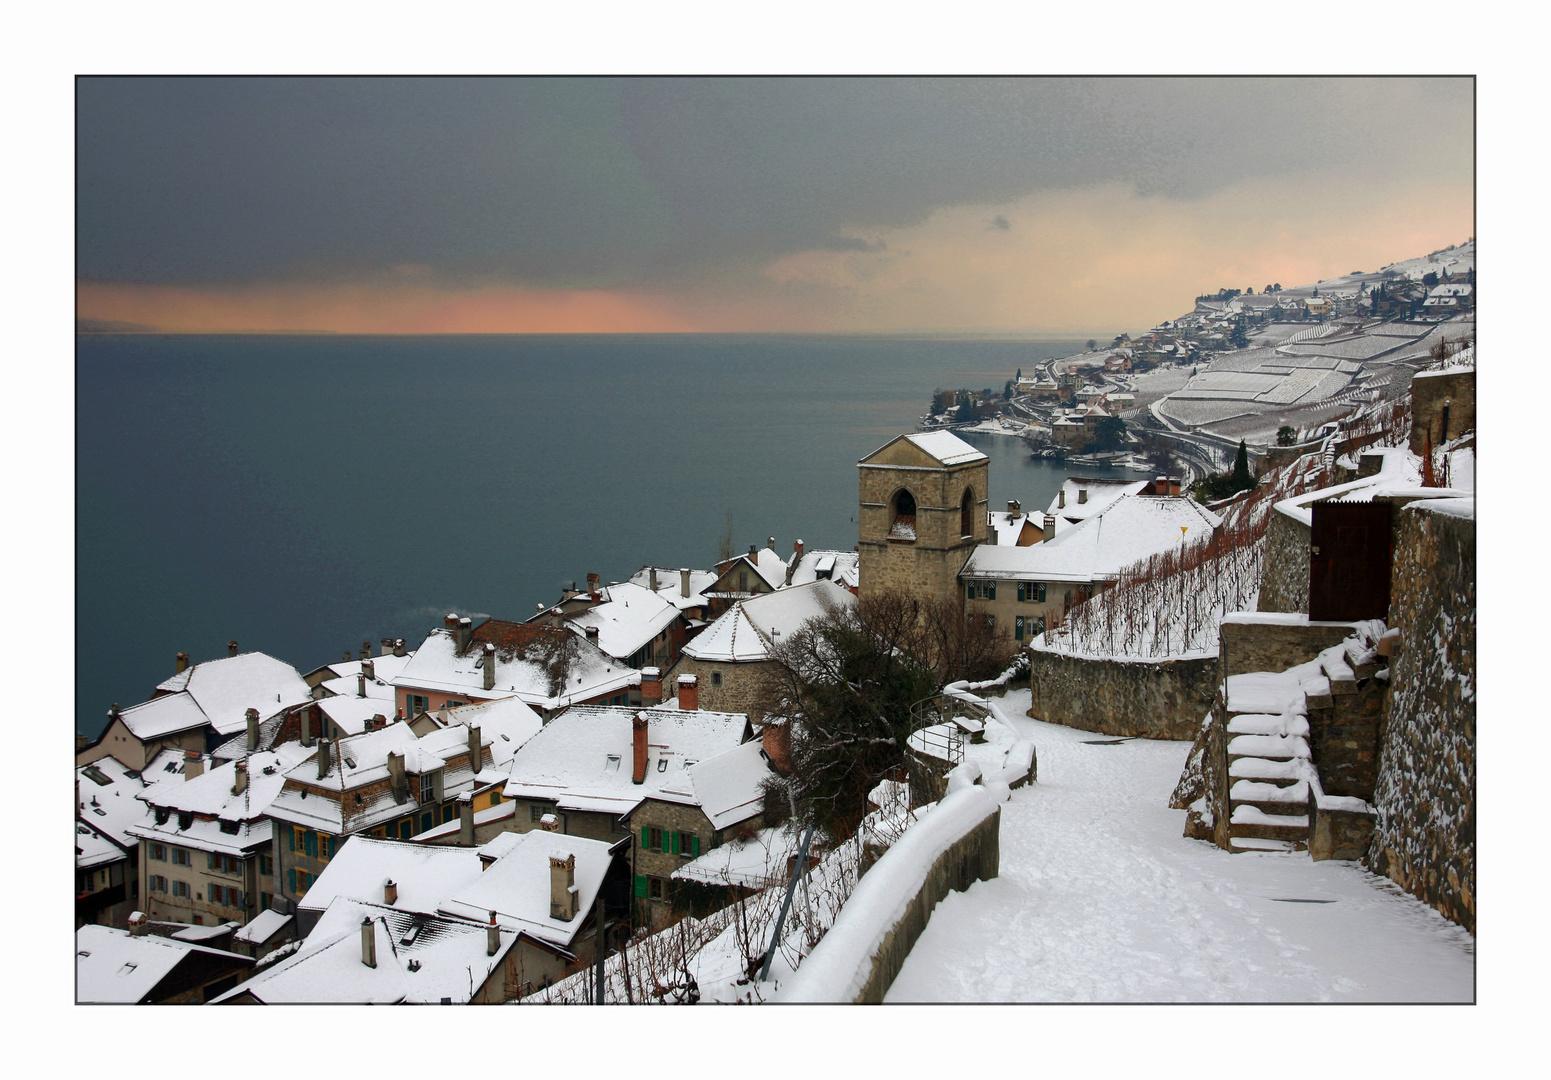 Winter in St. Saphorin